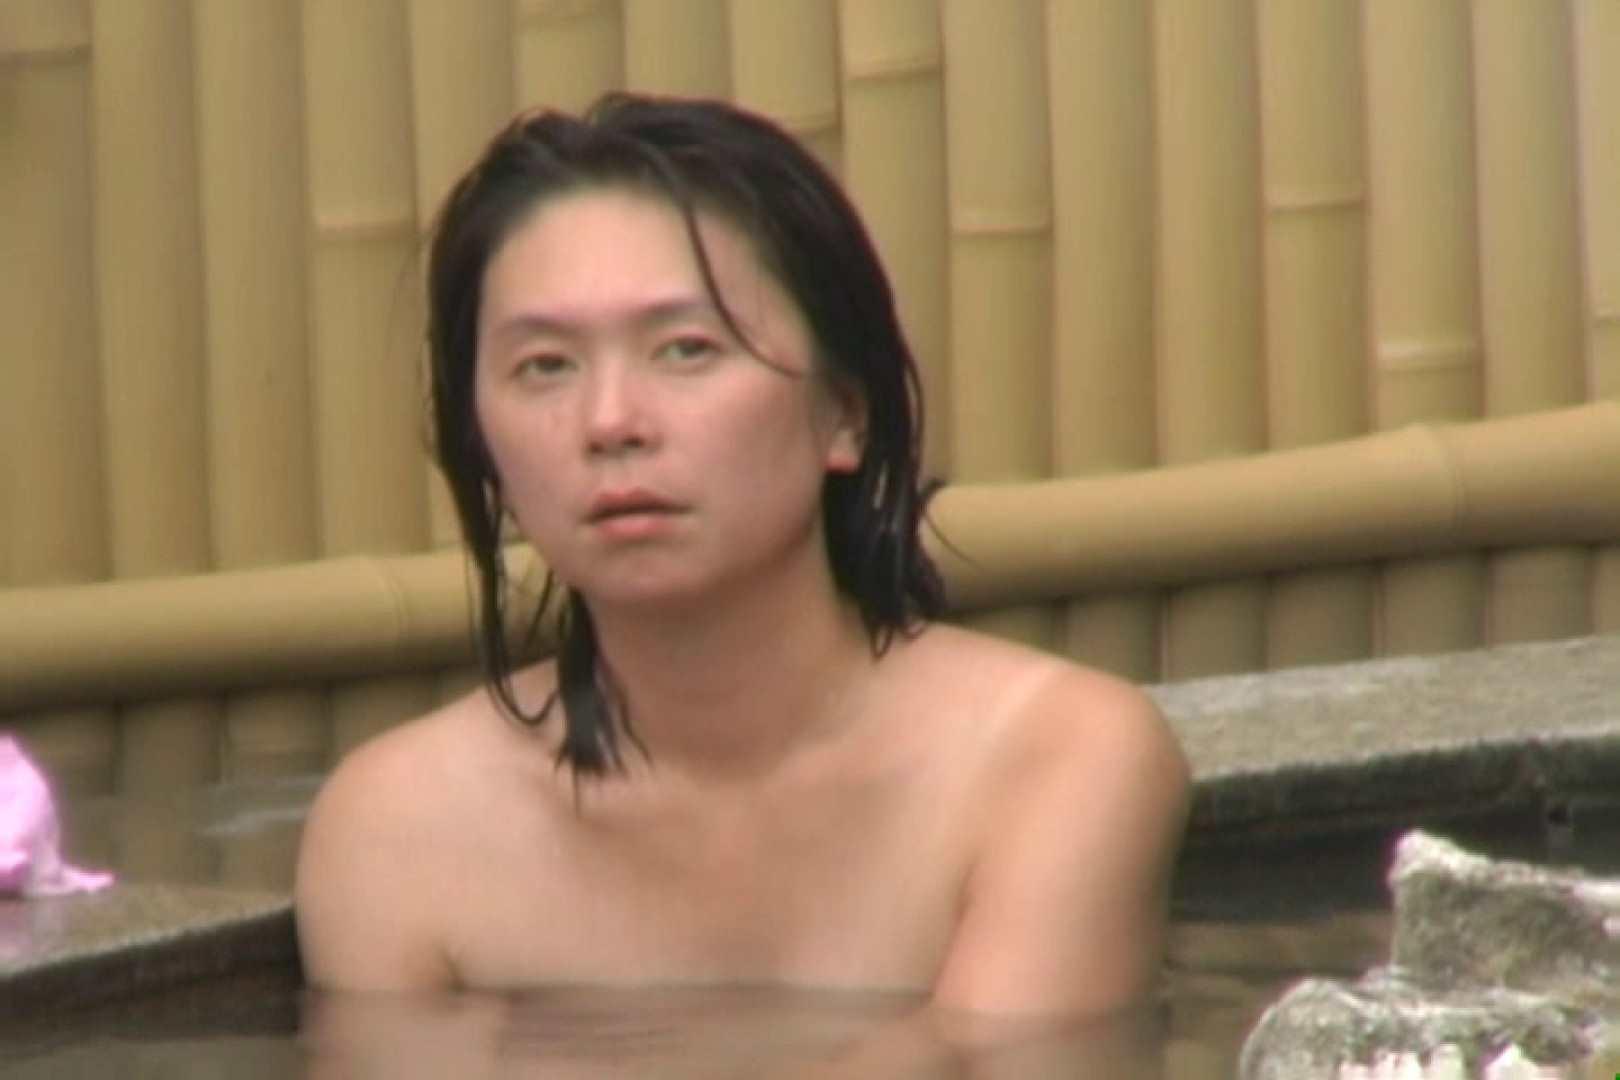 Aquaな露天風呂Vol.619 エッチな盗撮 ワレメ無修正動画無料 107pic 73